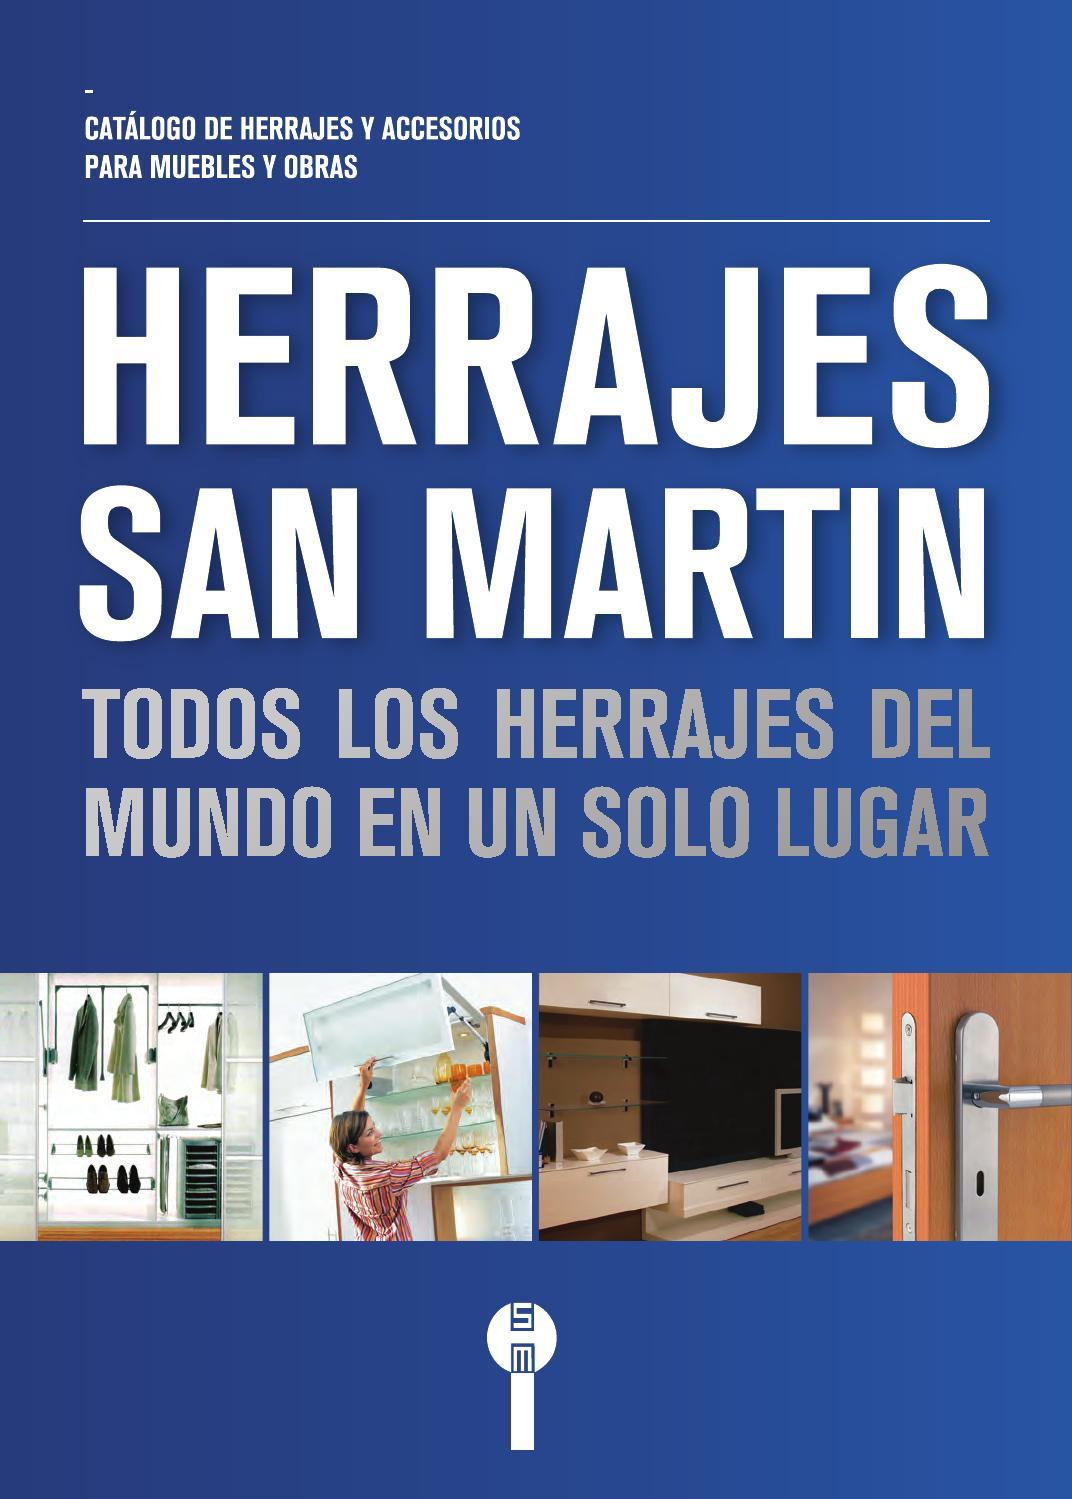 Catálogo de Herrajes San Martín 2015 by Herrajes San Martín - issuu